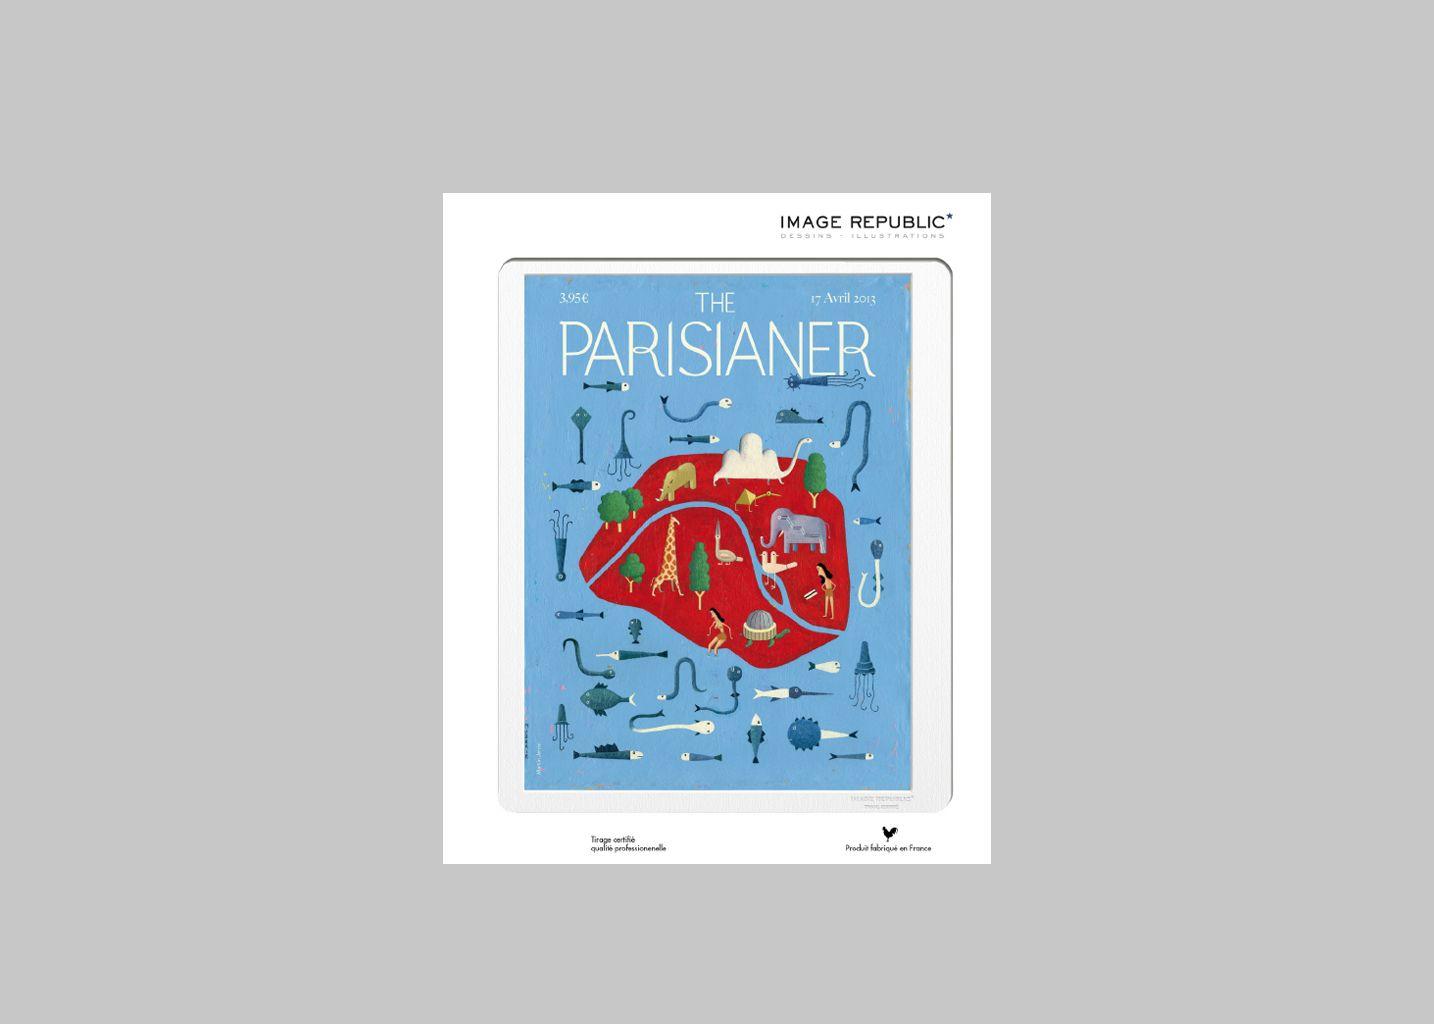 Affiche The Parisianer N°28 Jarry - Image Republic